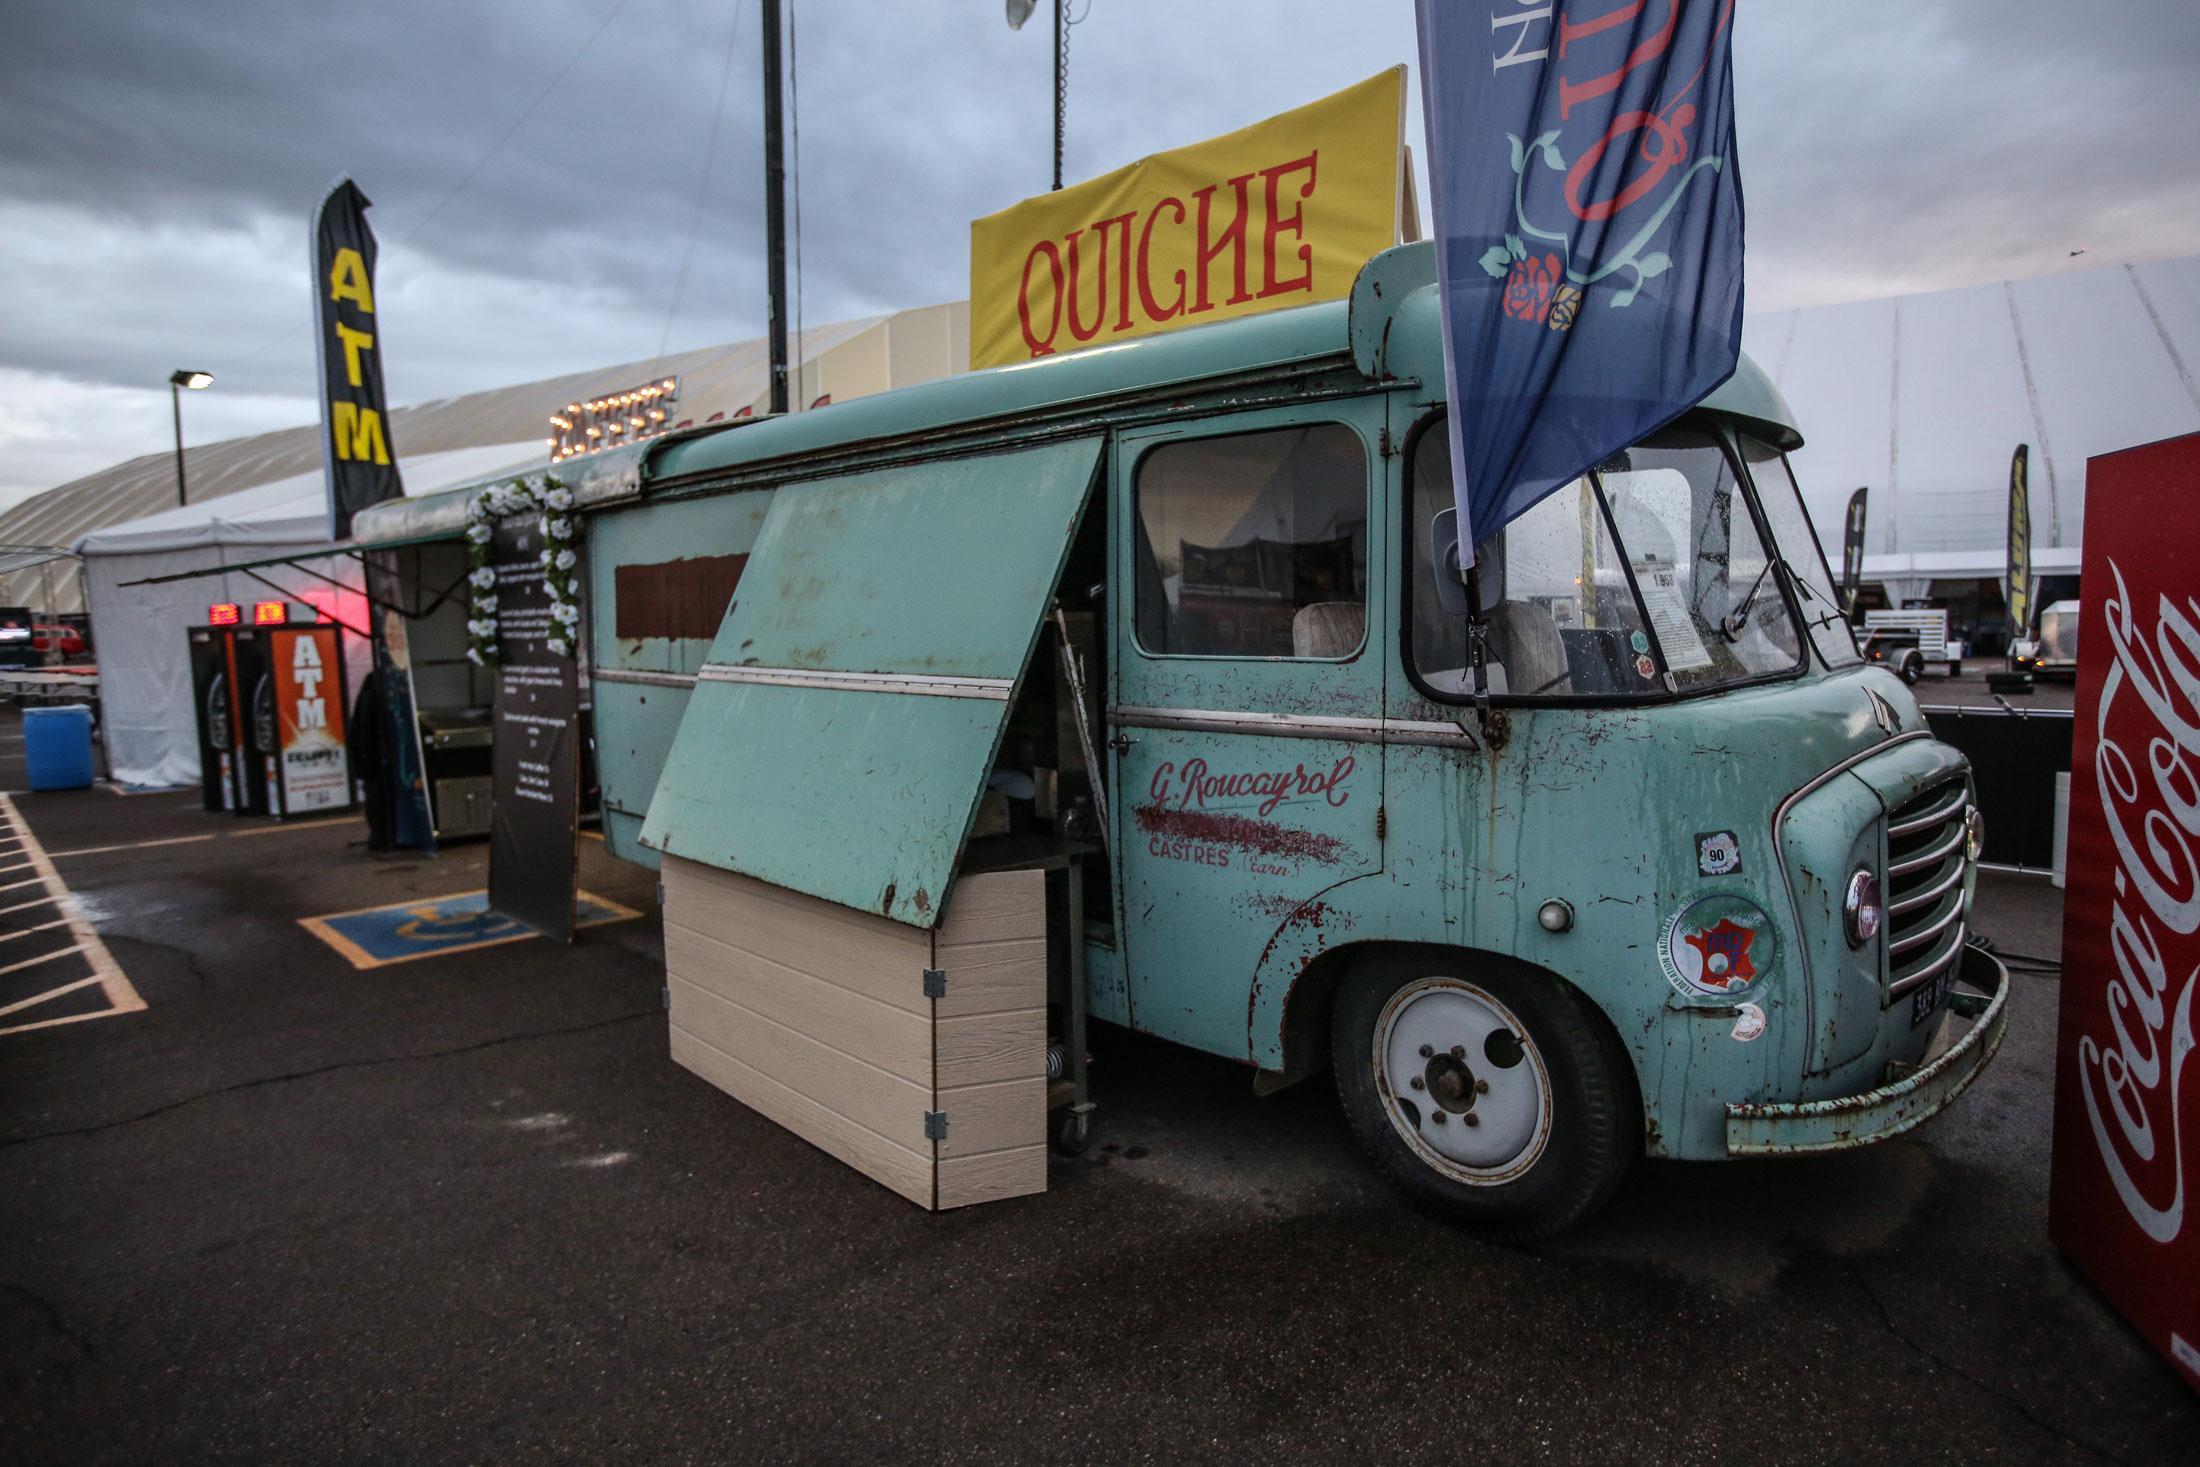 Citroën food truck